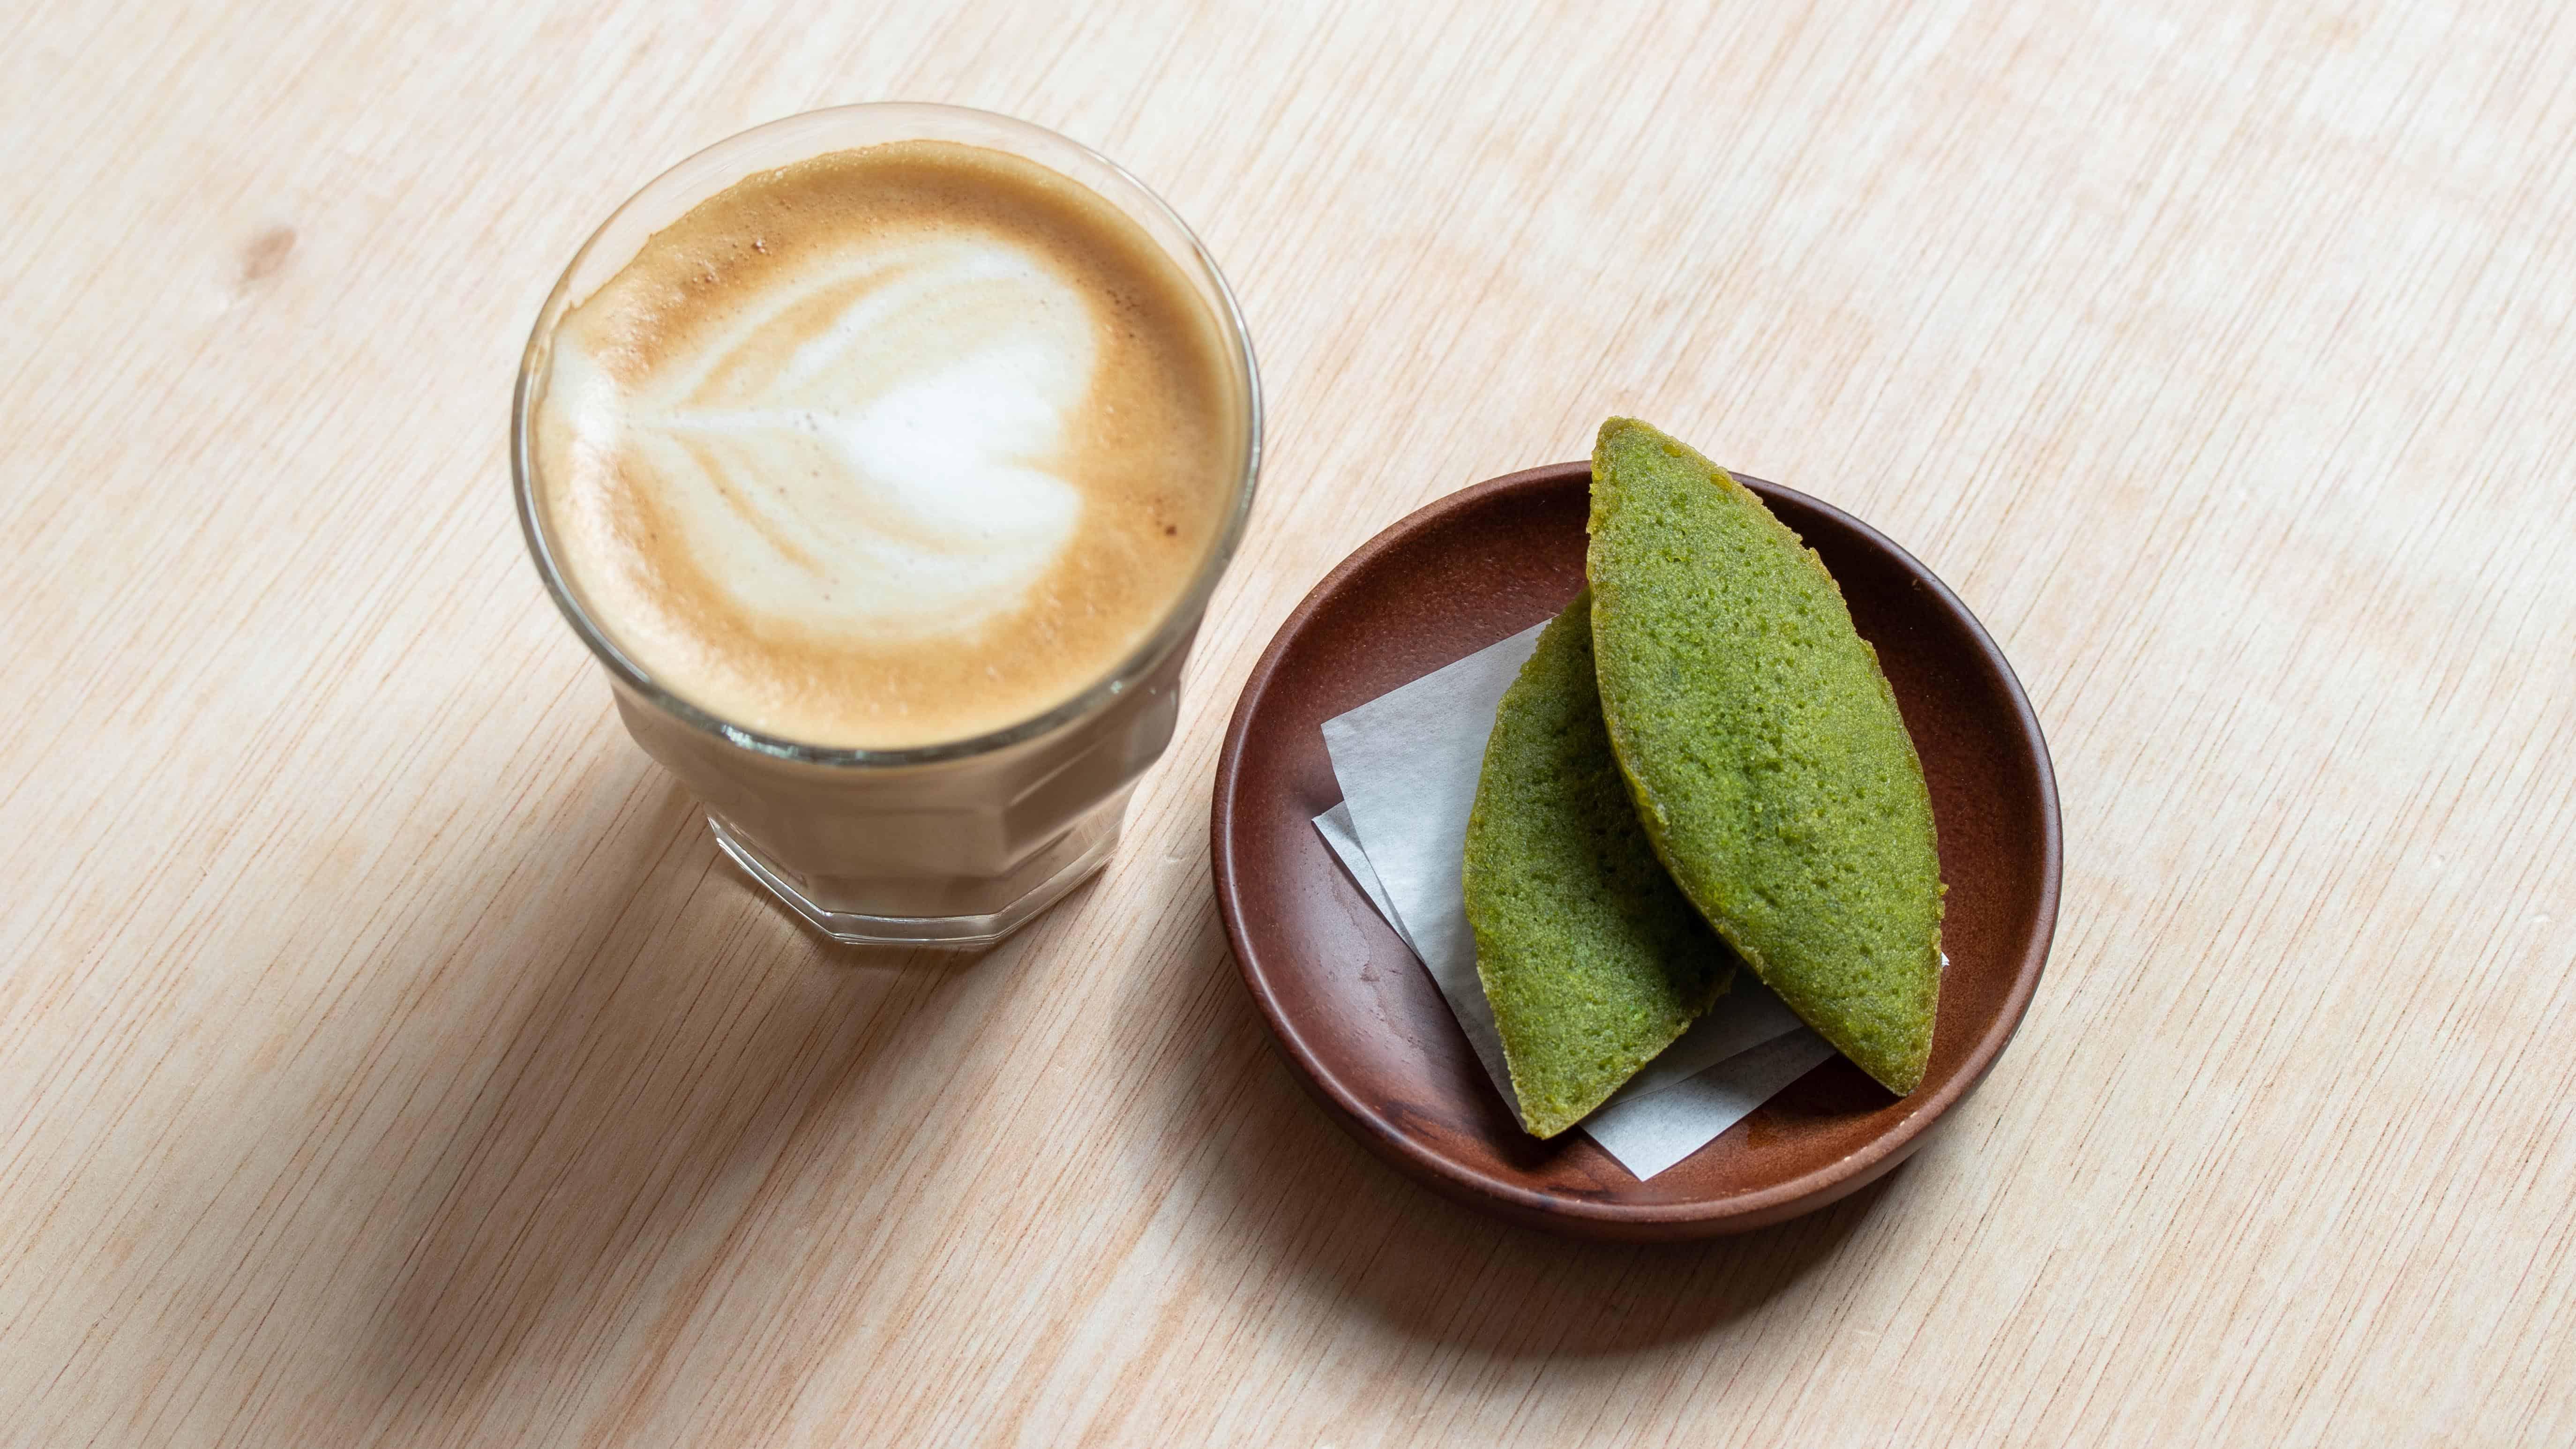 Matcha green tea financiers with tea for afternoon break